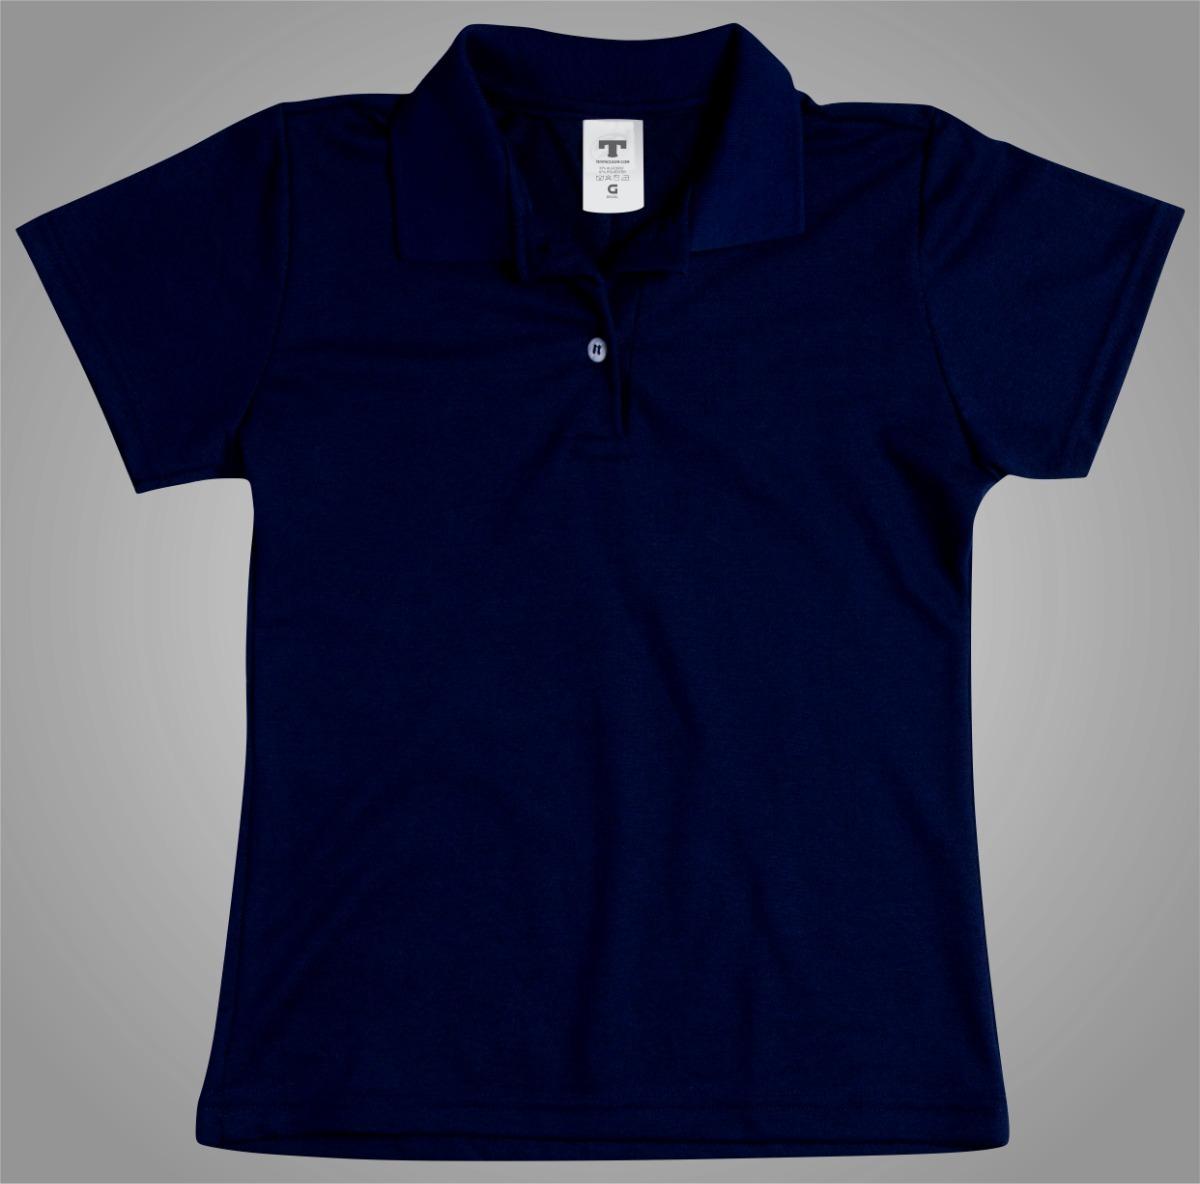 0f2aa6f45b ... camisa polo varias cores polo lisa tradicional blusa polo. Carregando  zoom.